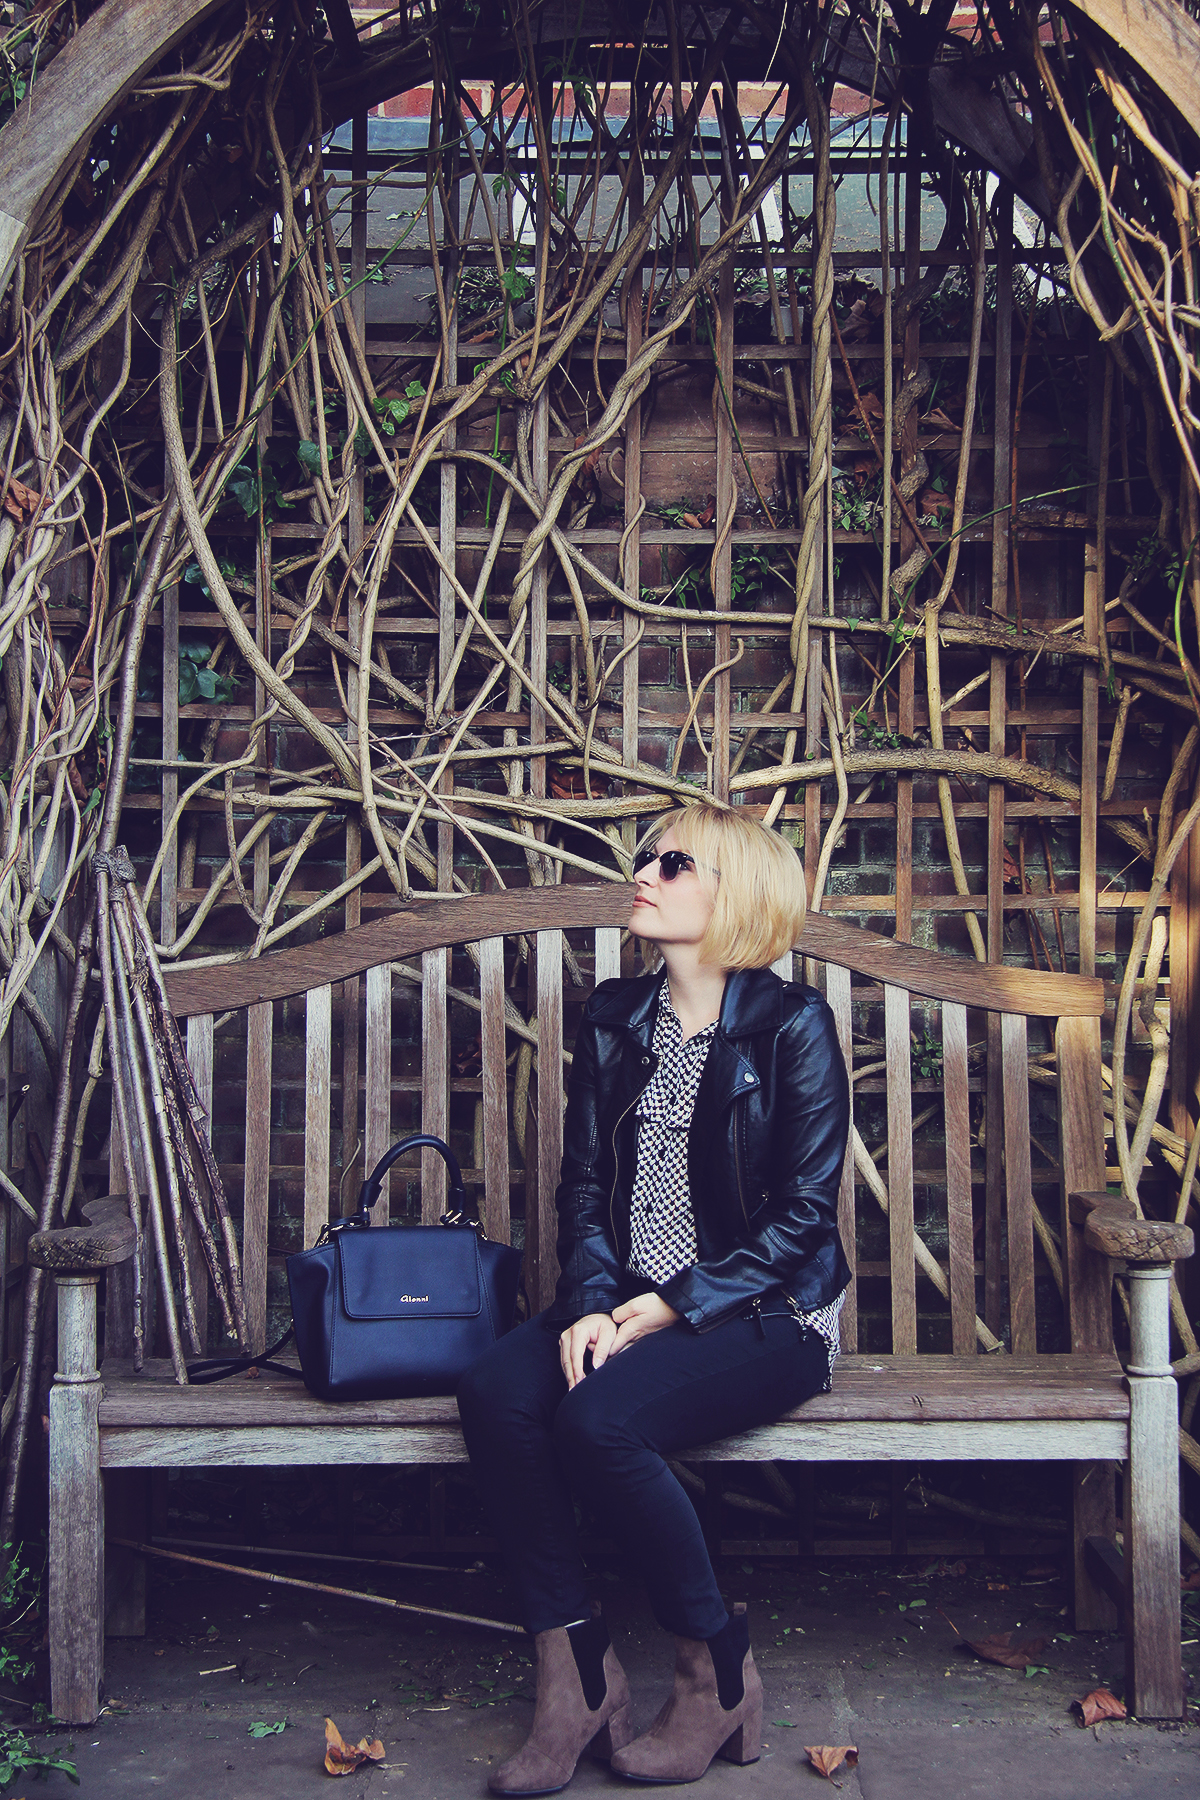 london-the-gardens-at-geffrye-museum